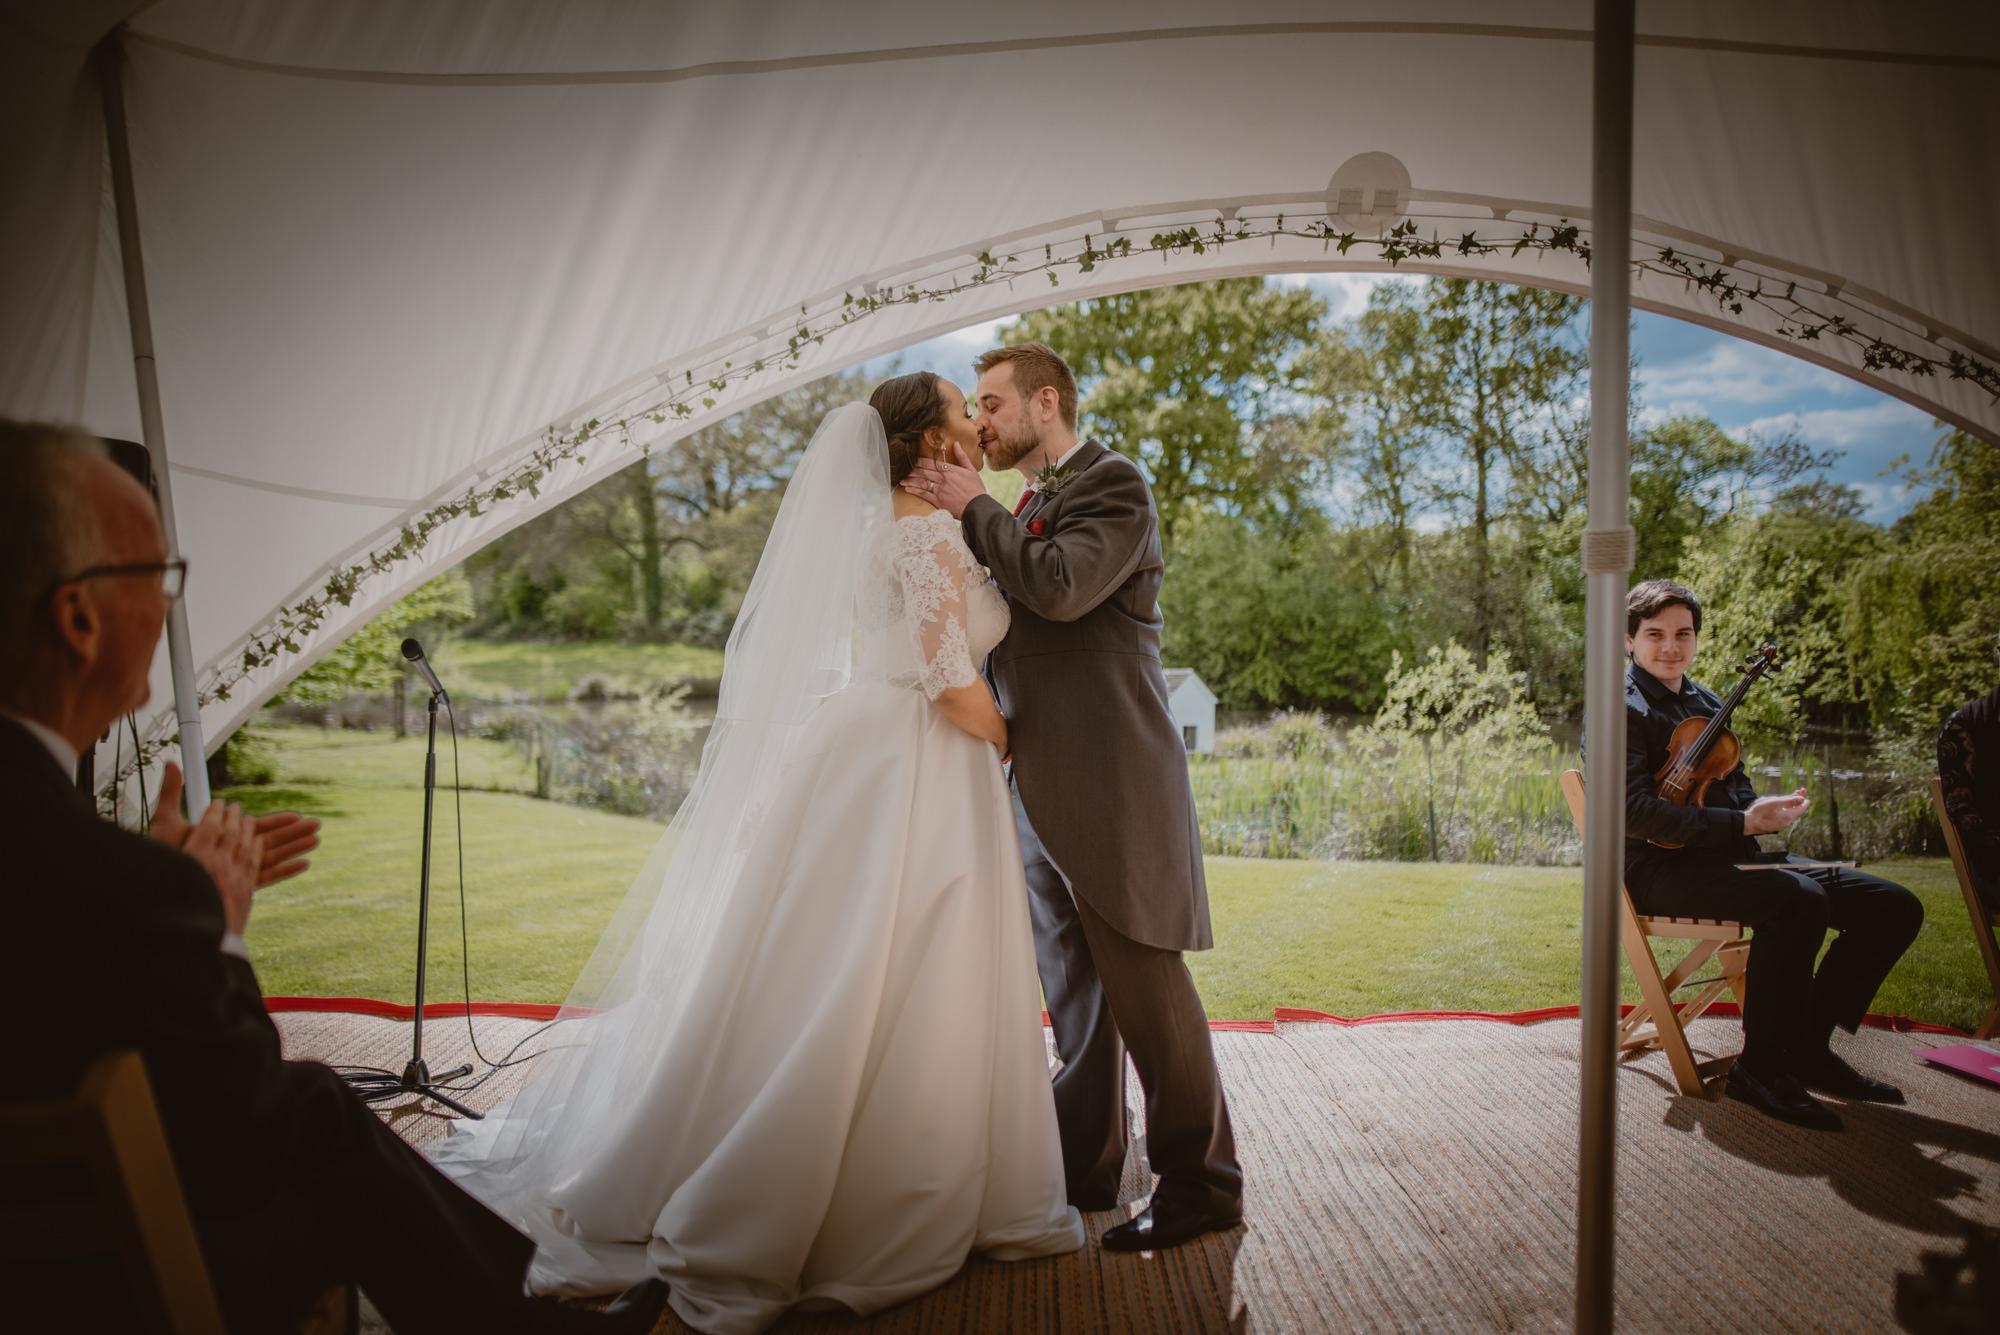 Jacqueline-Gareth-Wedding-Westmead-Events-Surrey-Manu-Mendoza-Wedding-Photography-263.jpg